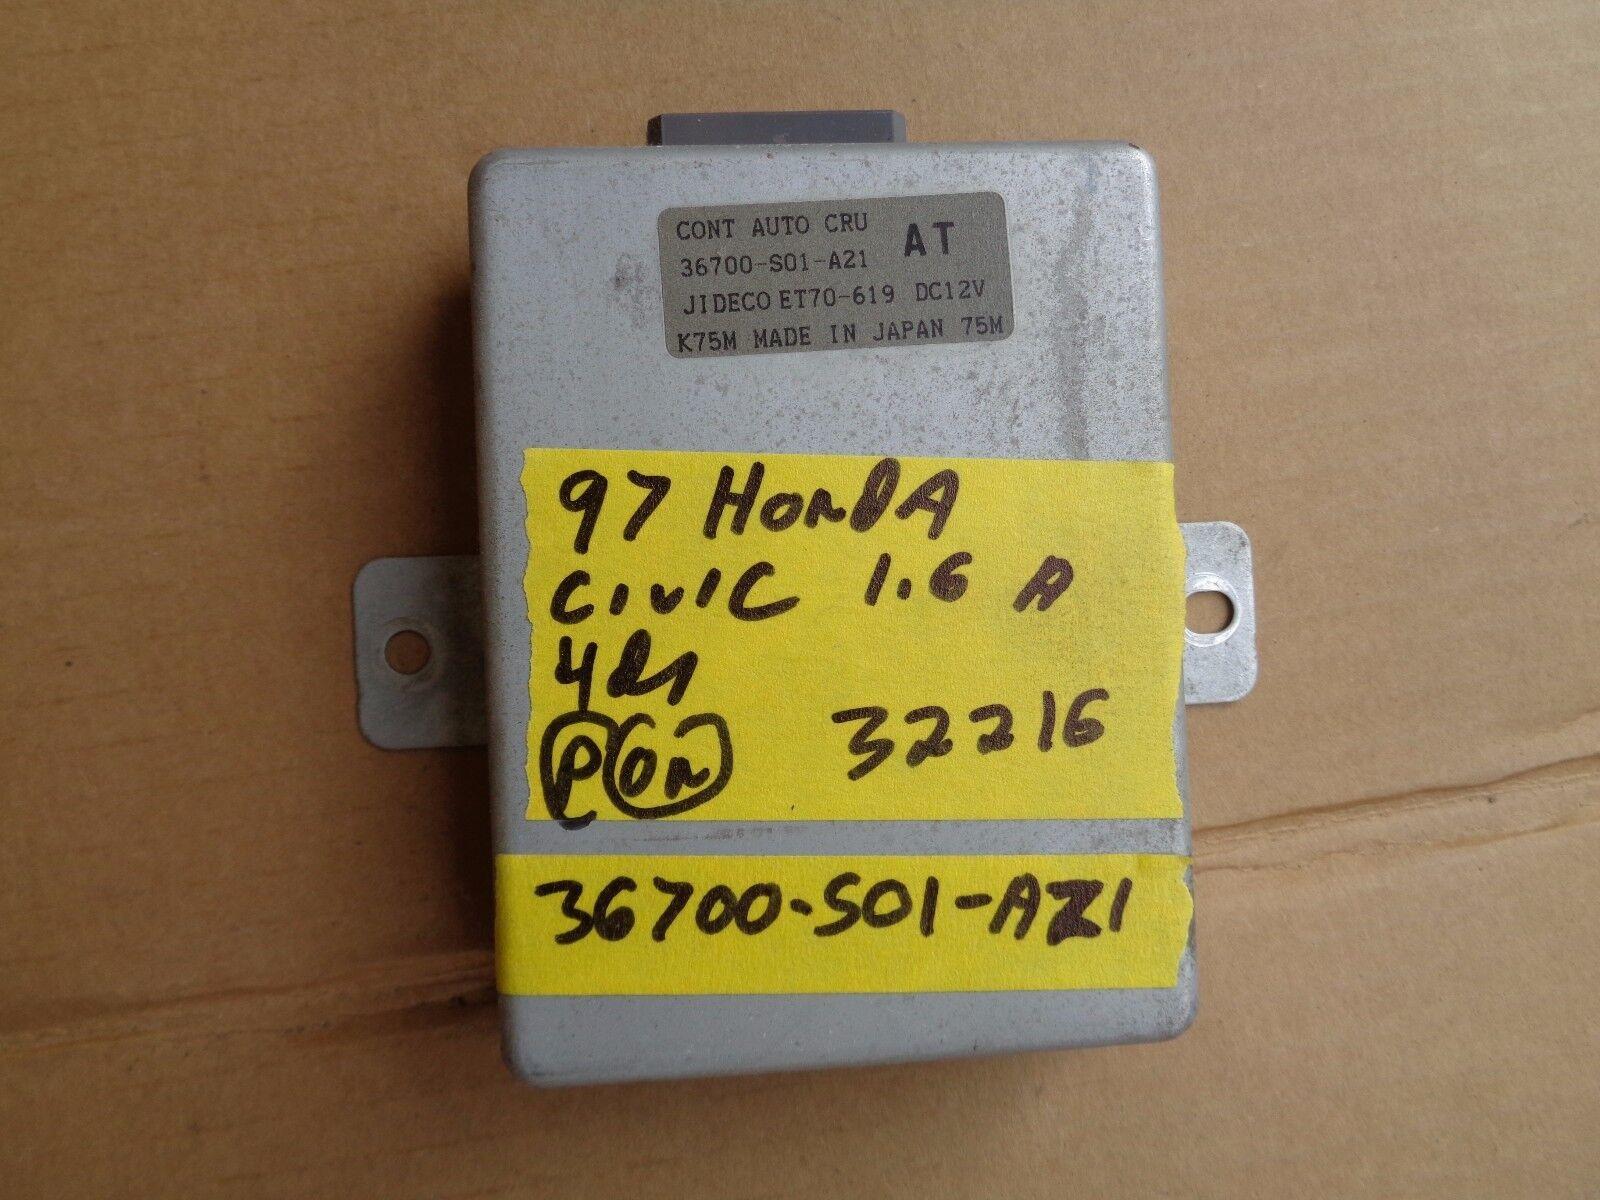 1997 honda civic cruise control modual computer 32216-7a b117 computor module